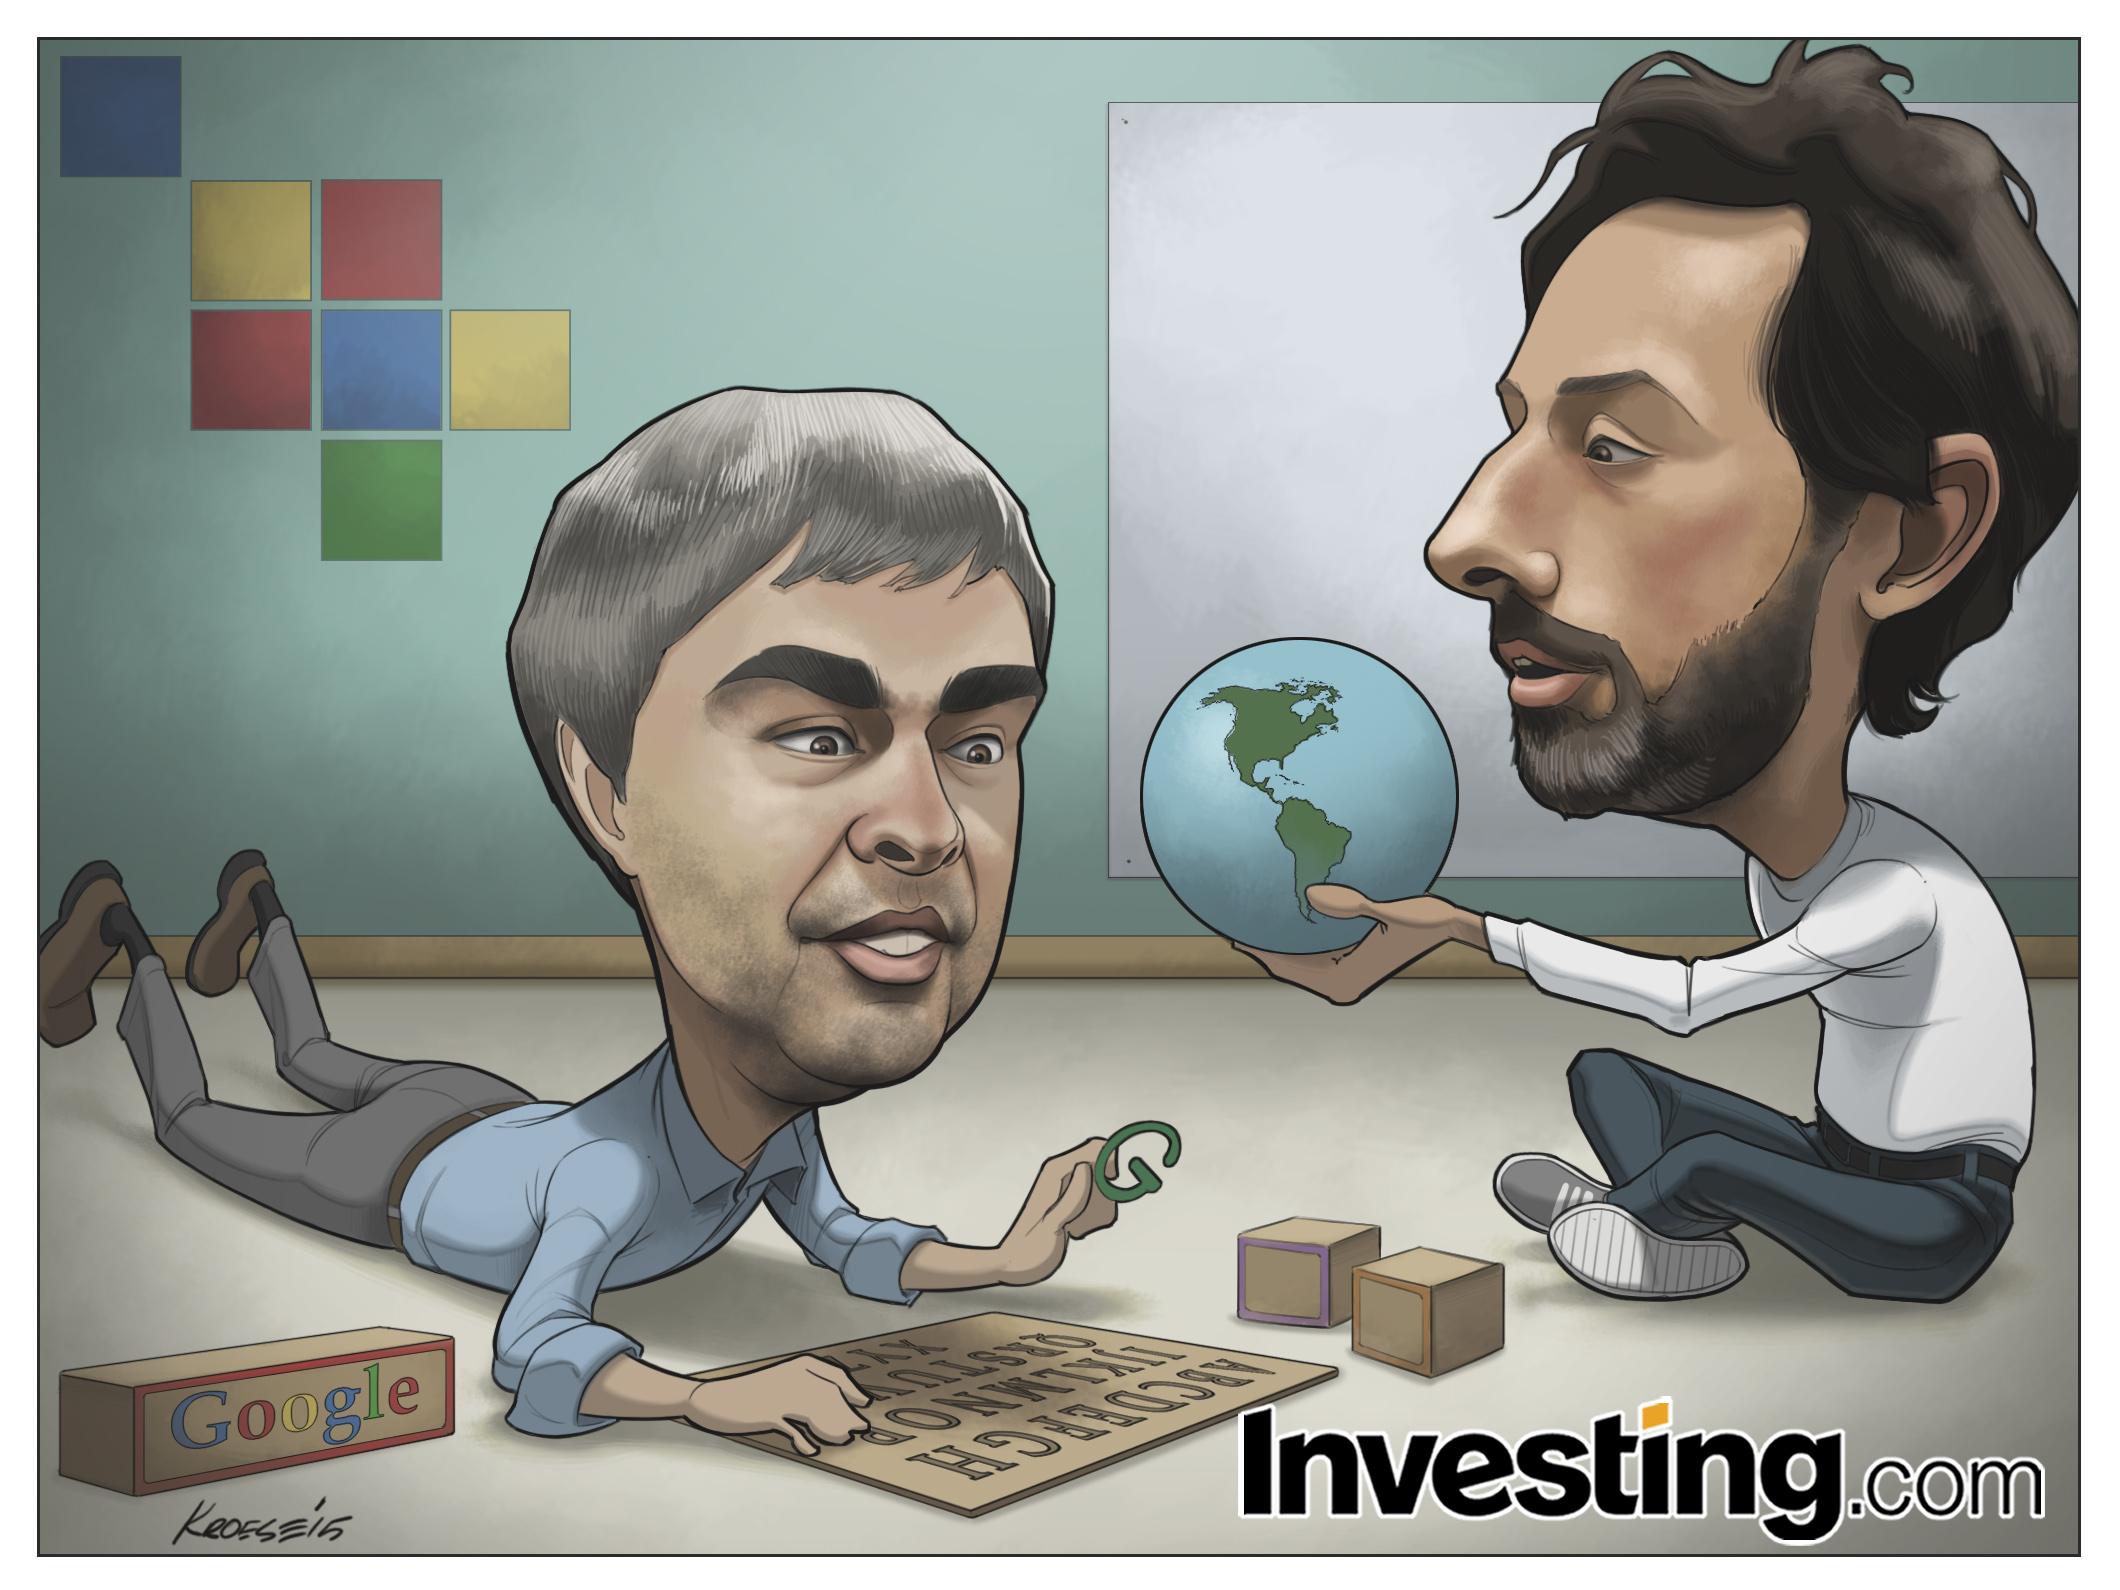 Investing.com comic Google 8.13.15